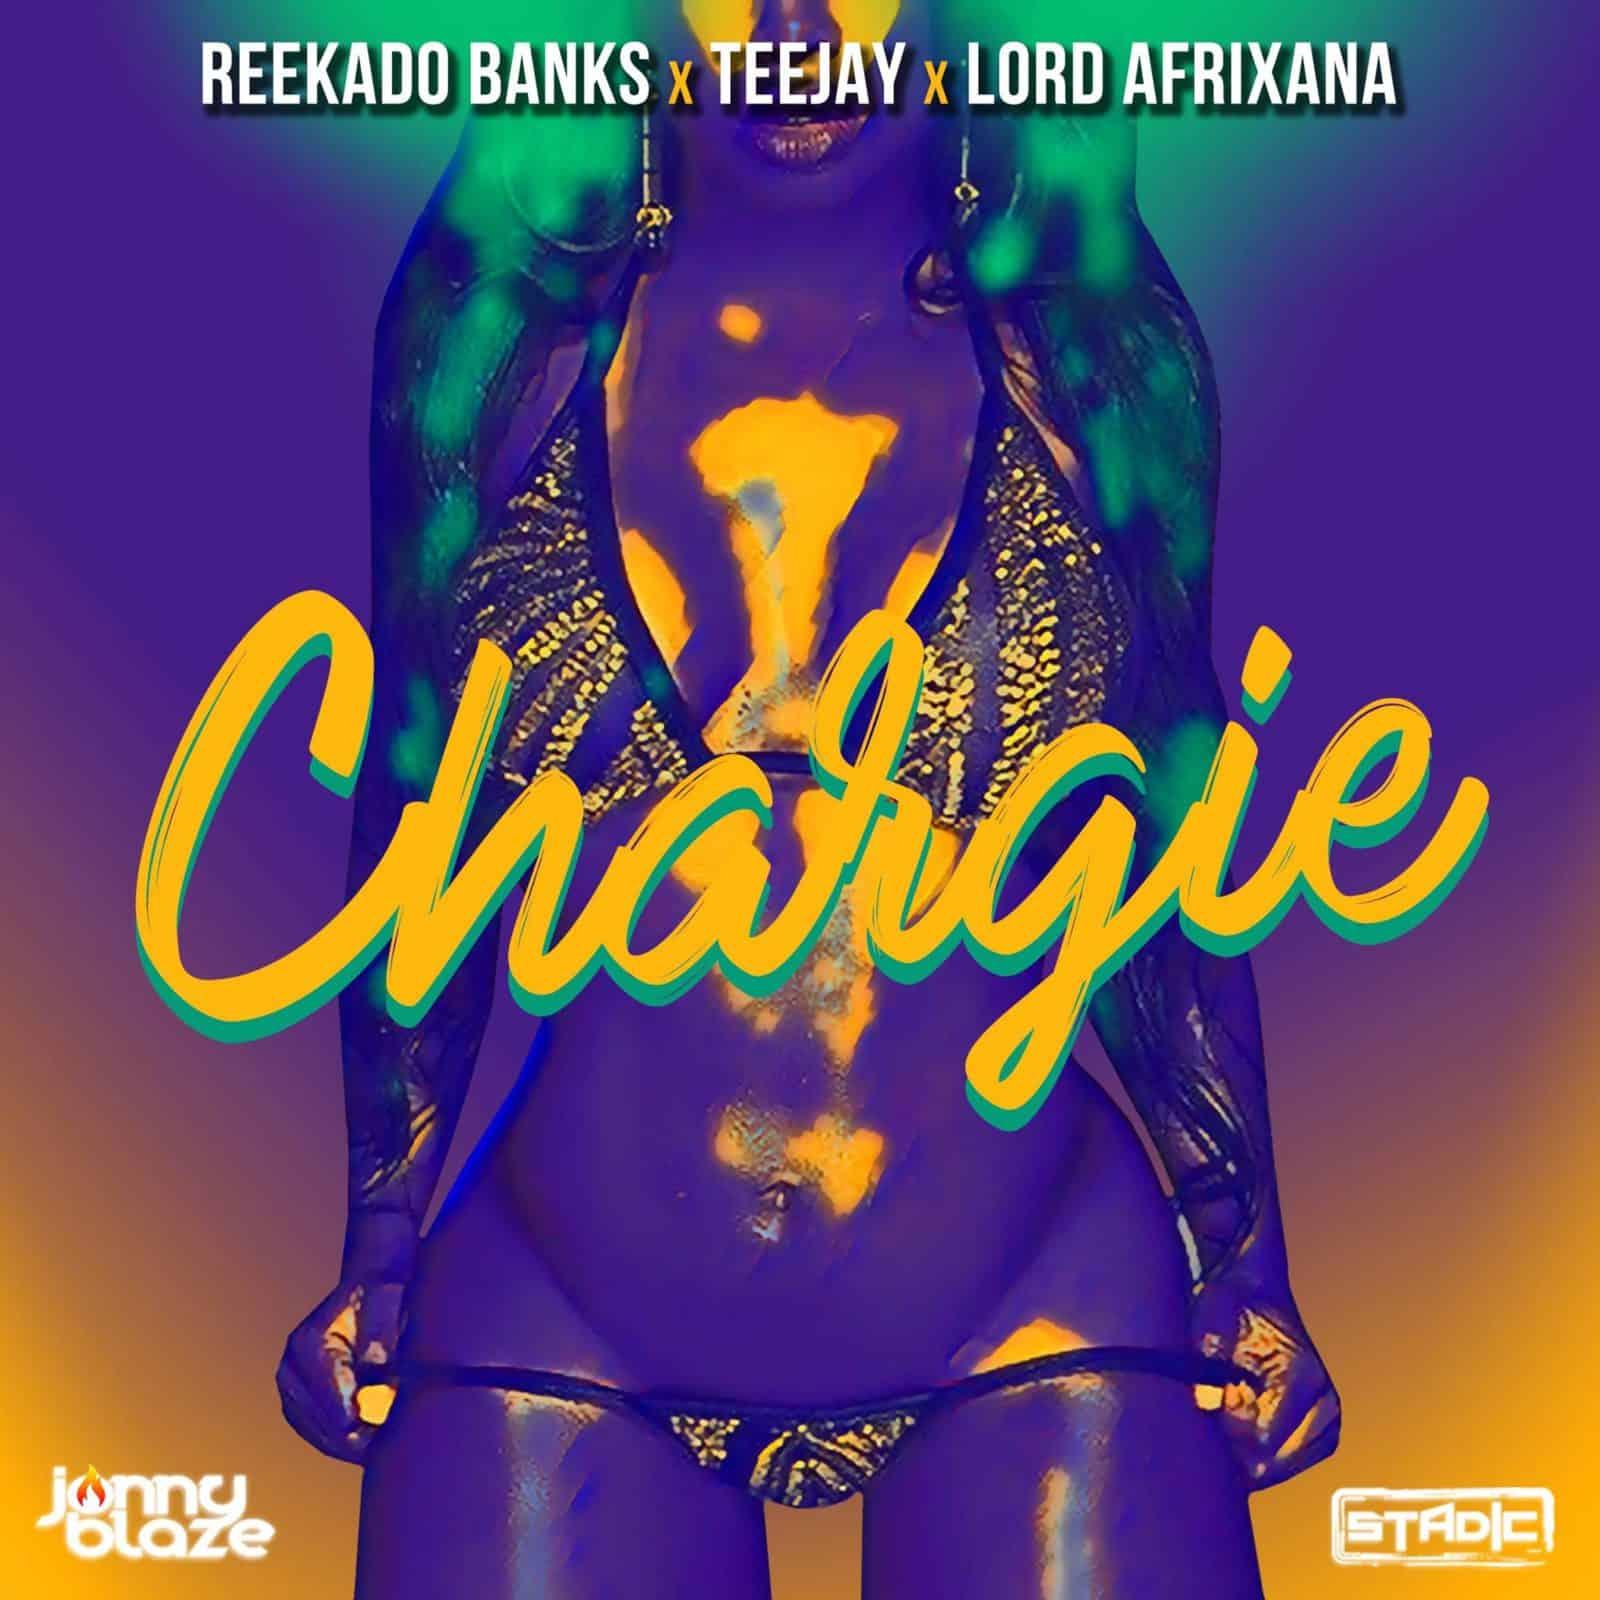 Reekado Banks x Teejay x Lord Afrixana ft. Jonny Blaze & Stadic - Chargie